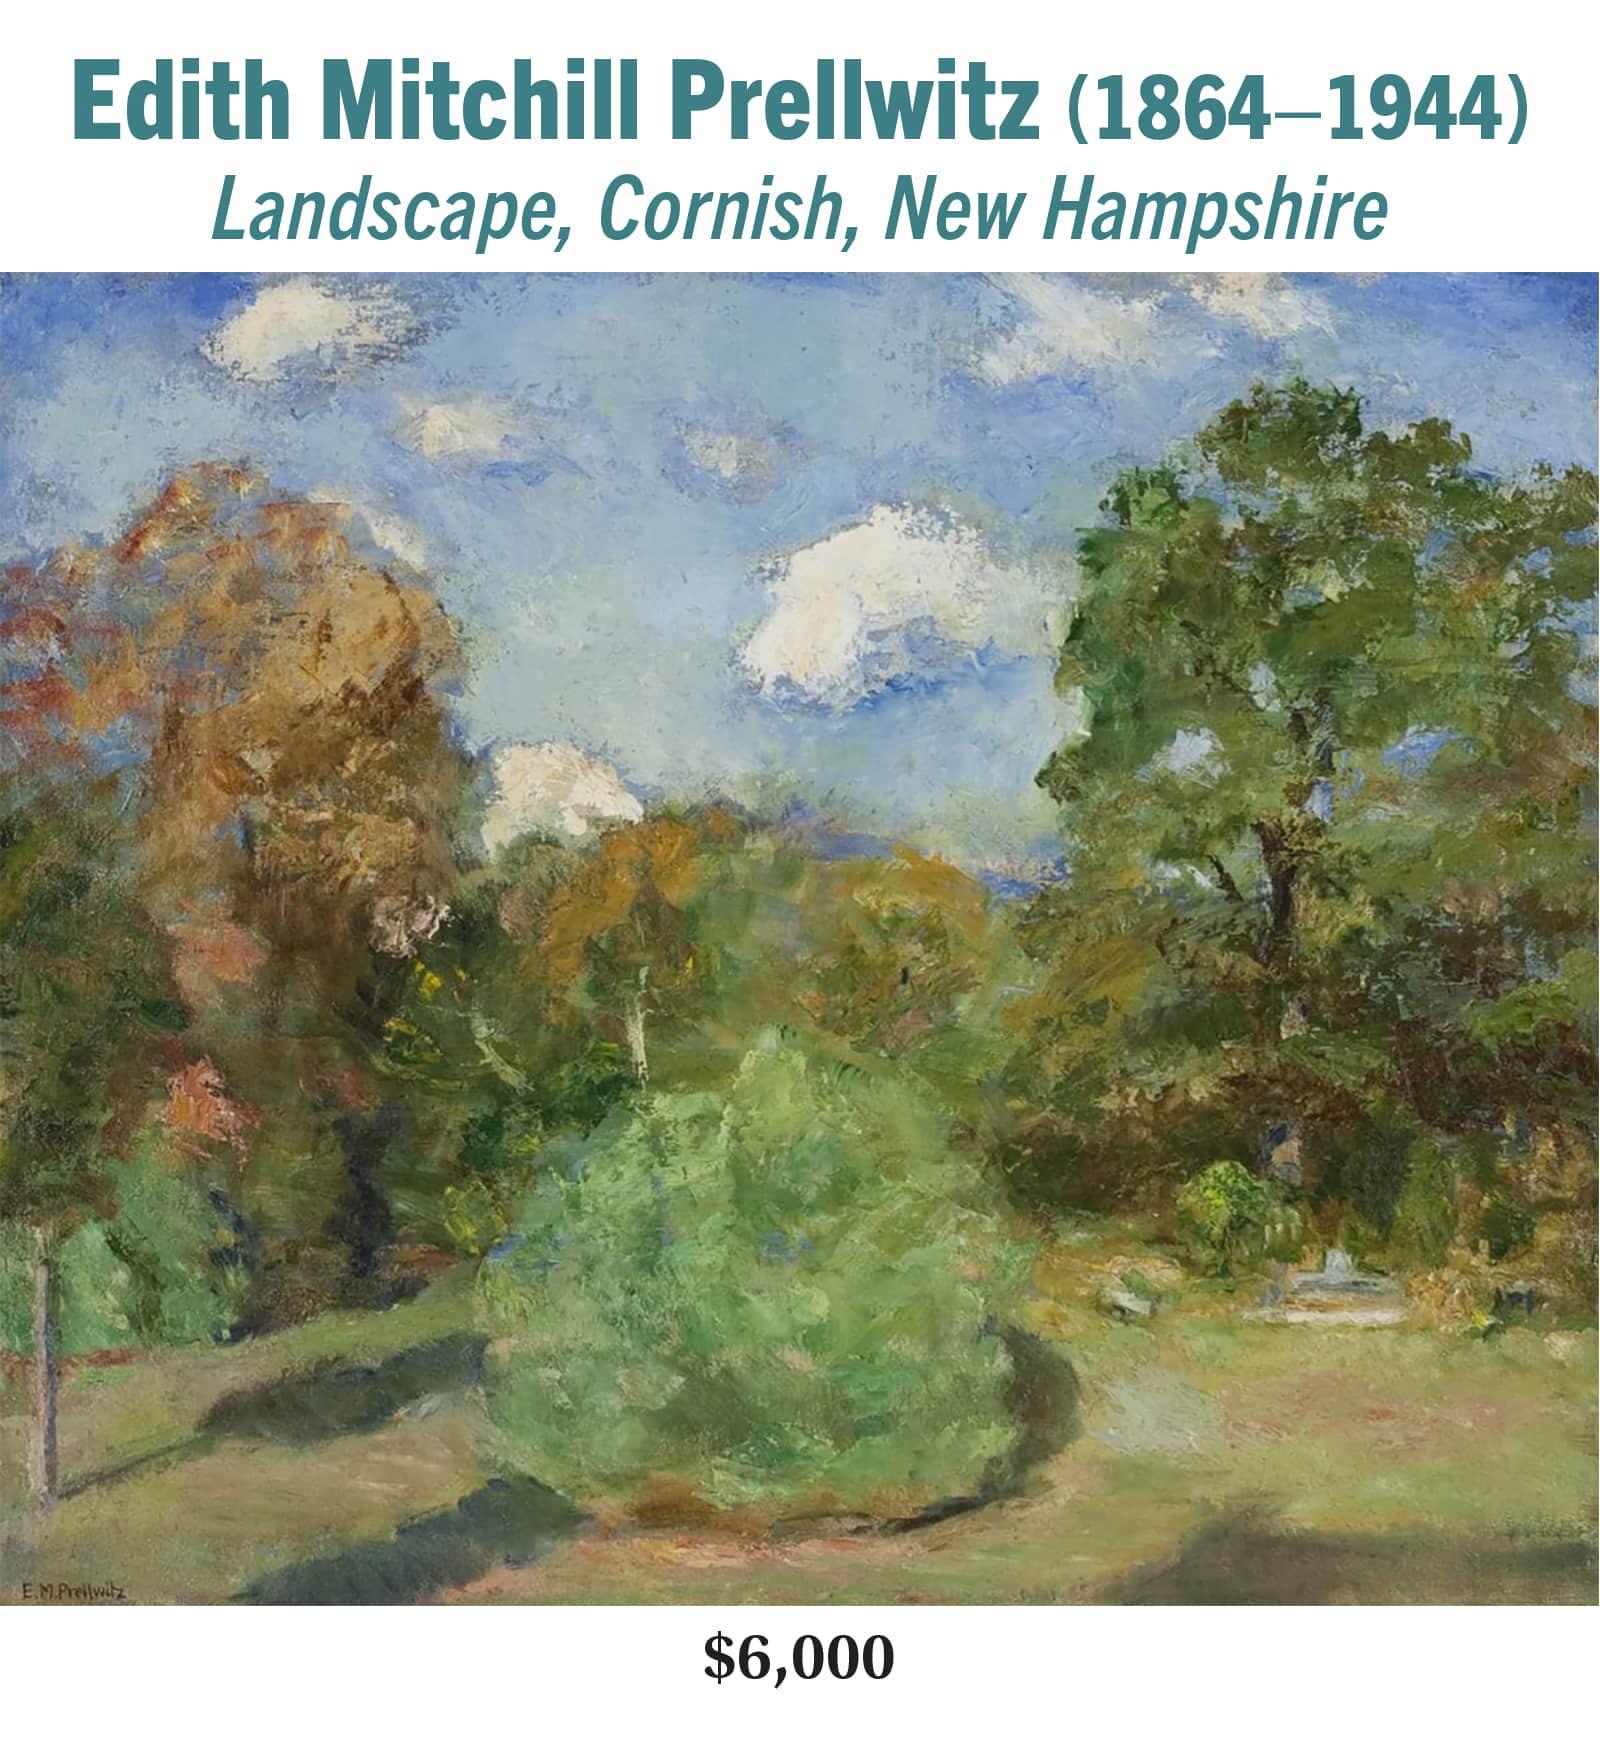 Edith Mitchill Prellwitz (1864–1944), Landscape, Cornish, New Hampshire, oil on canvas, American impressionist landscape painting